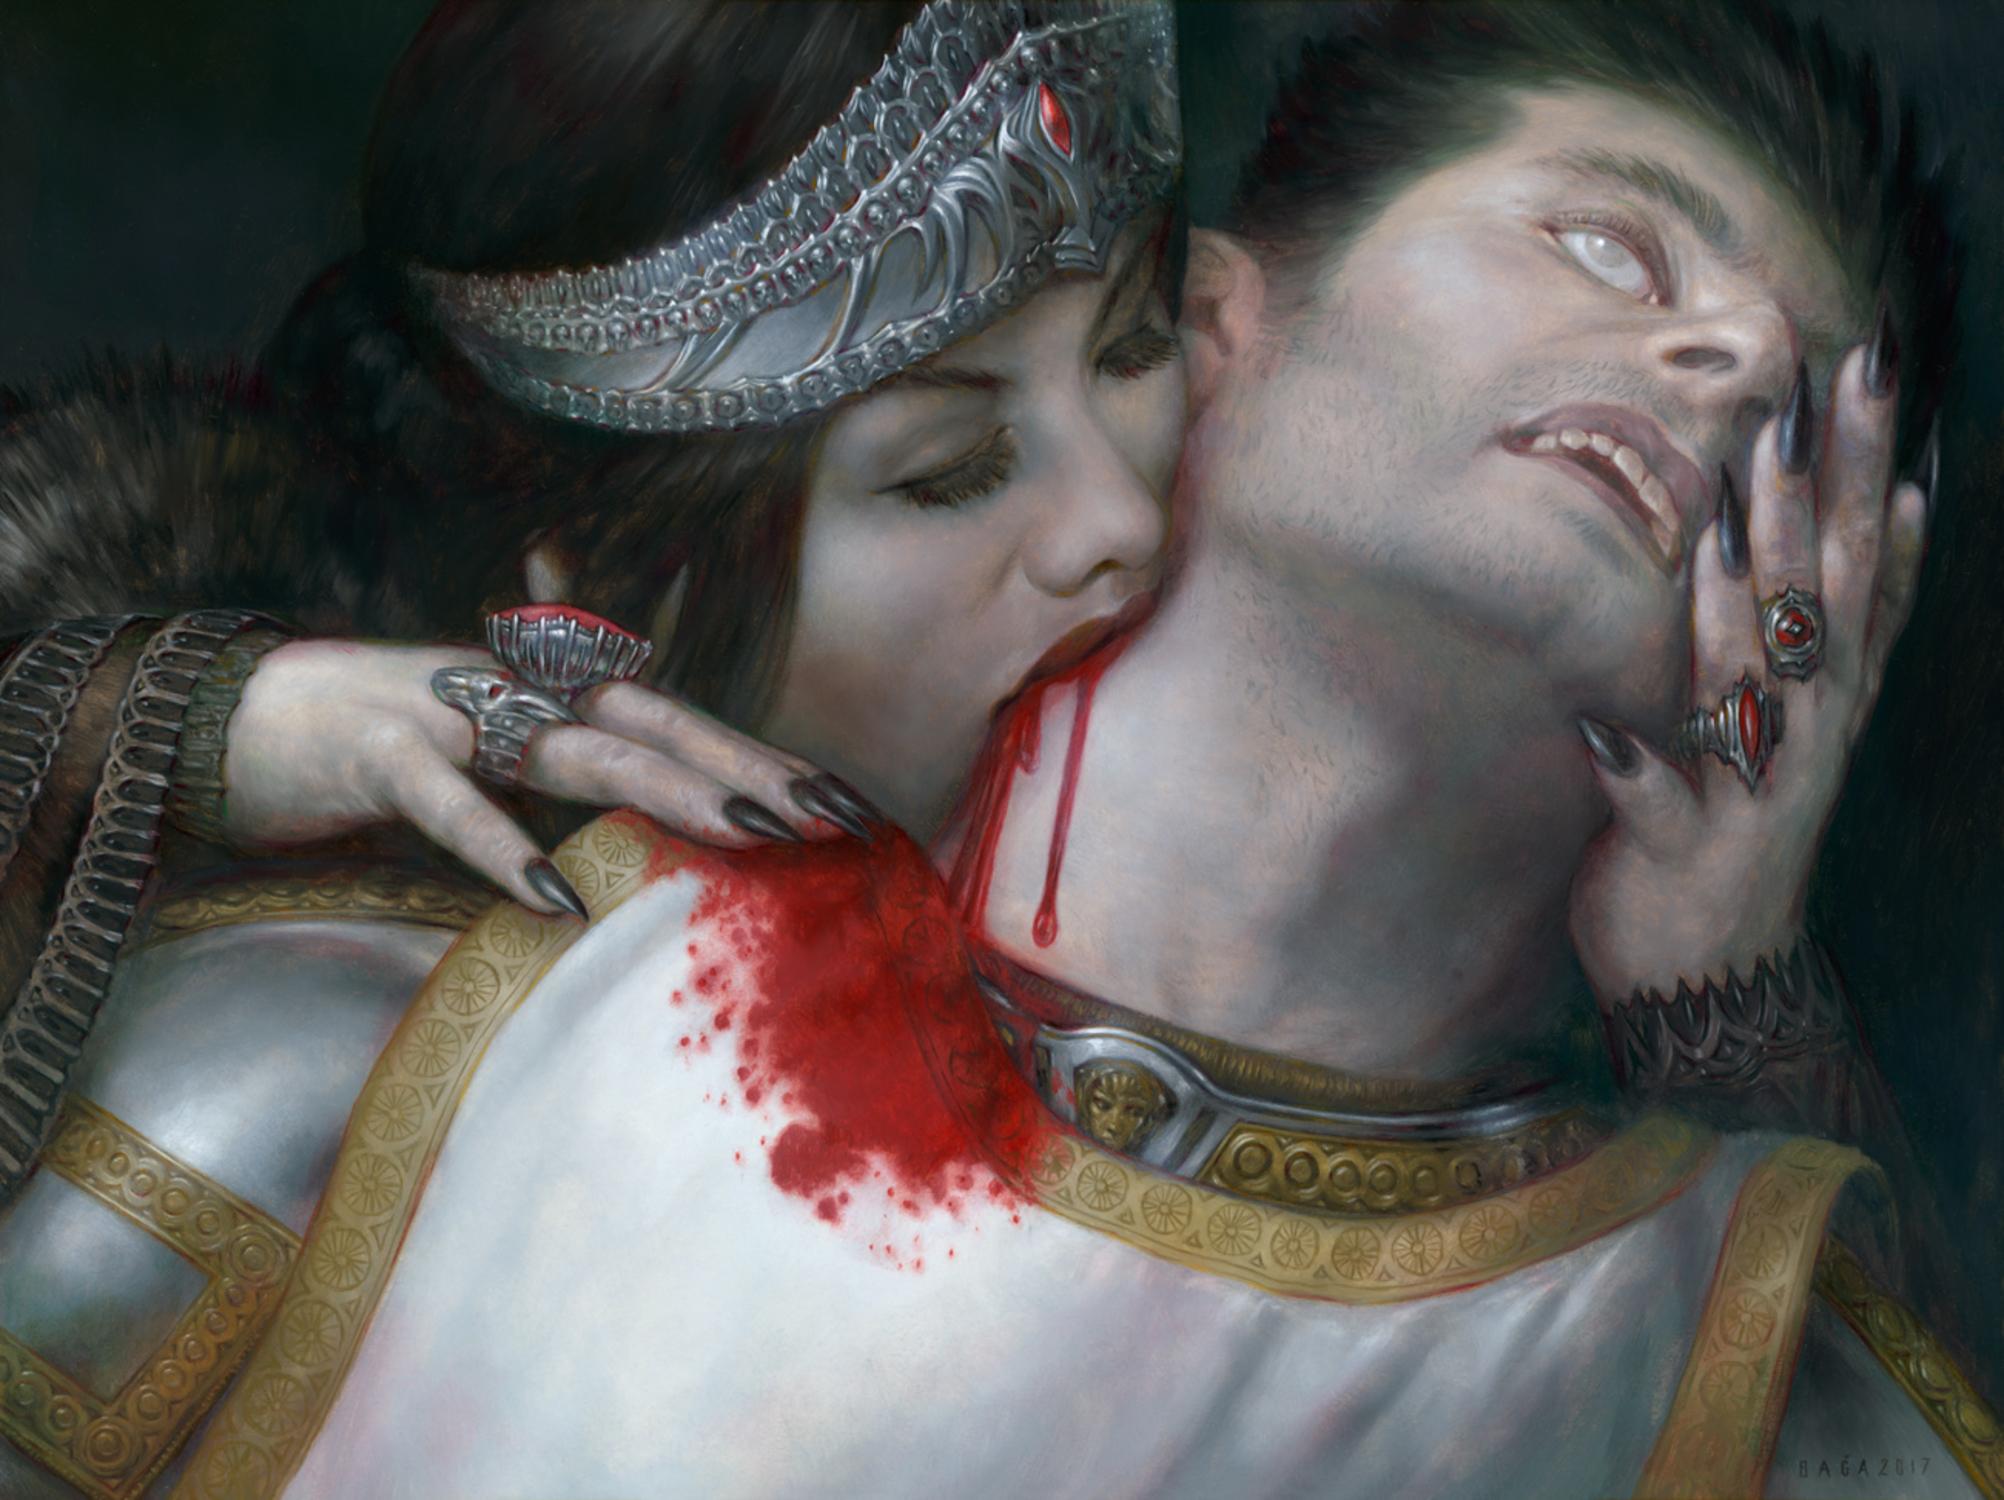 Sovereign's Bite Artwork by Volkan Baga